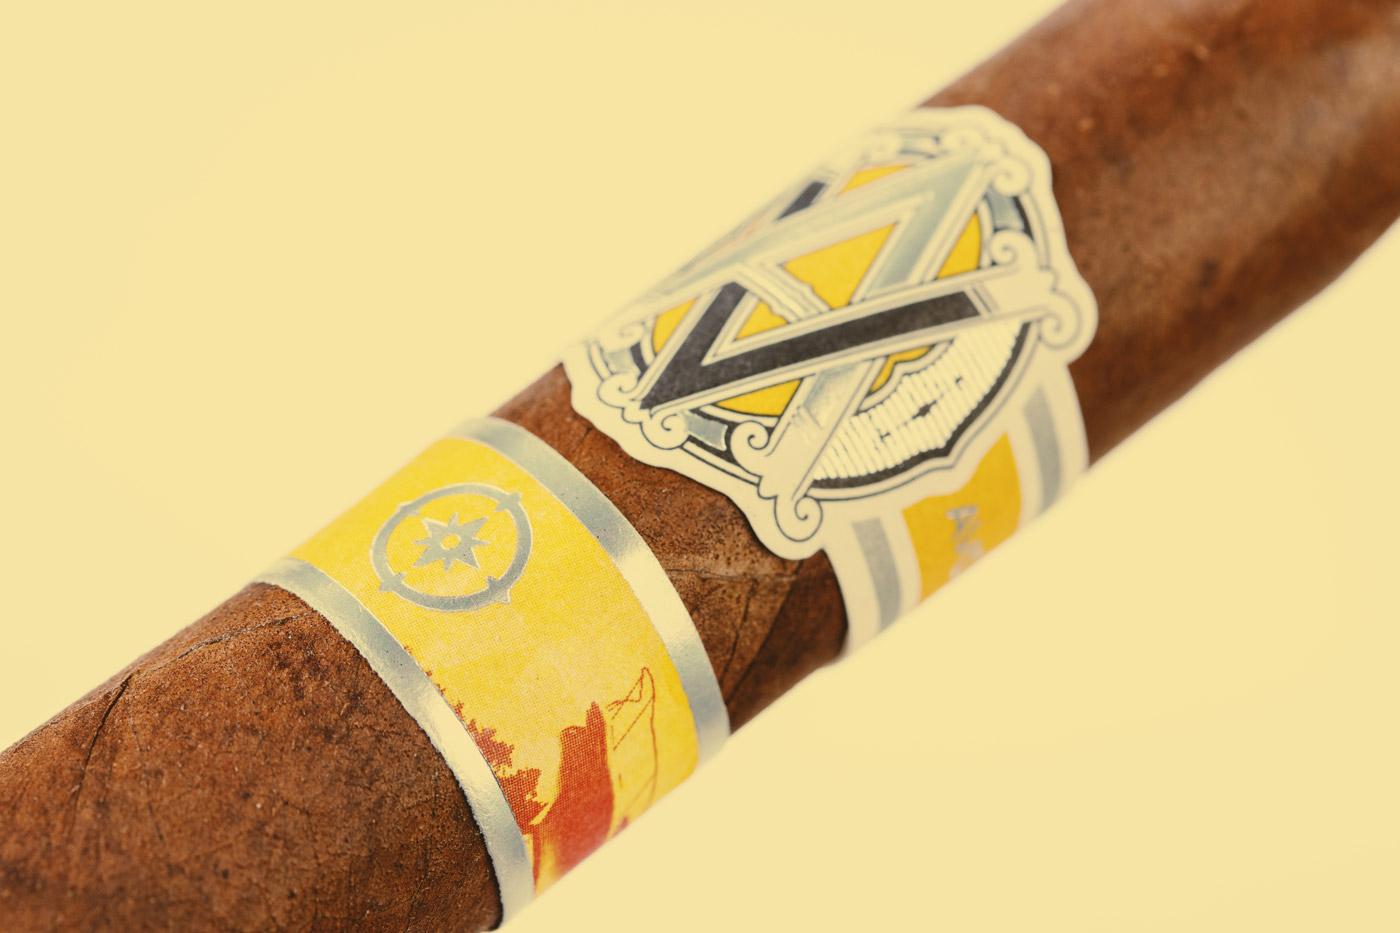 AVO Regional North Edition cigar review